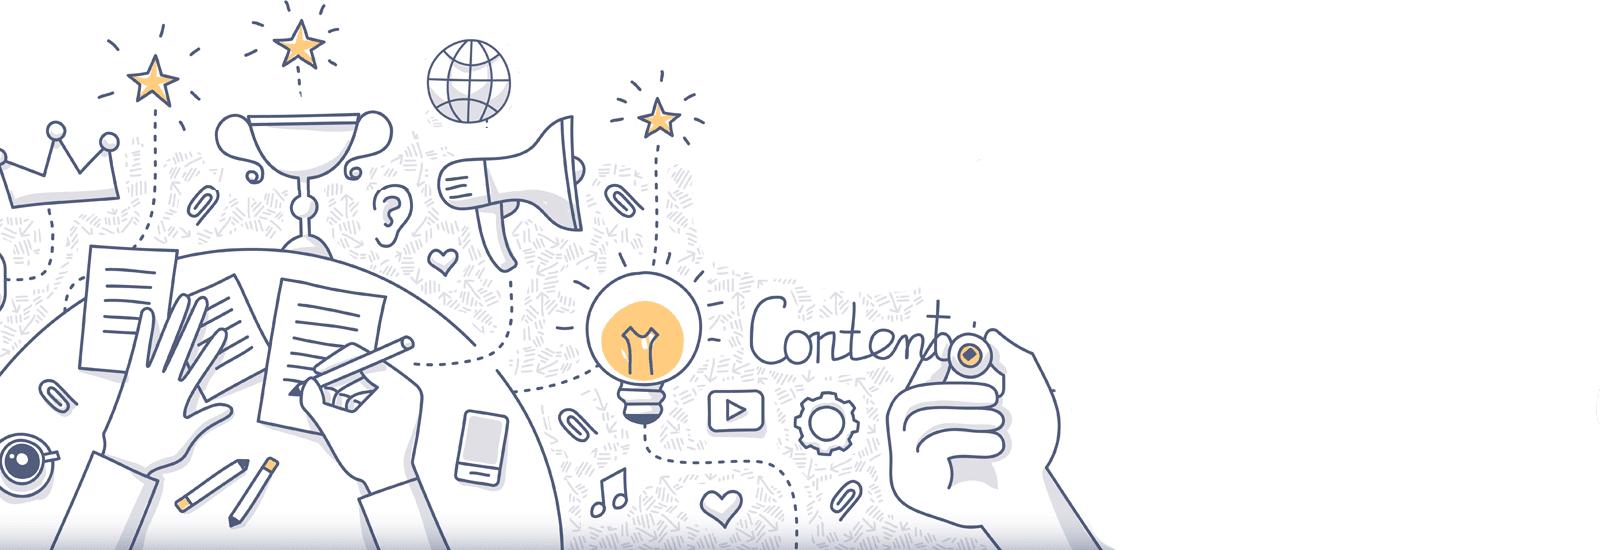 Reason Digital Empowerment - Content Marketing 2.0